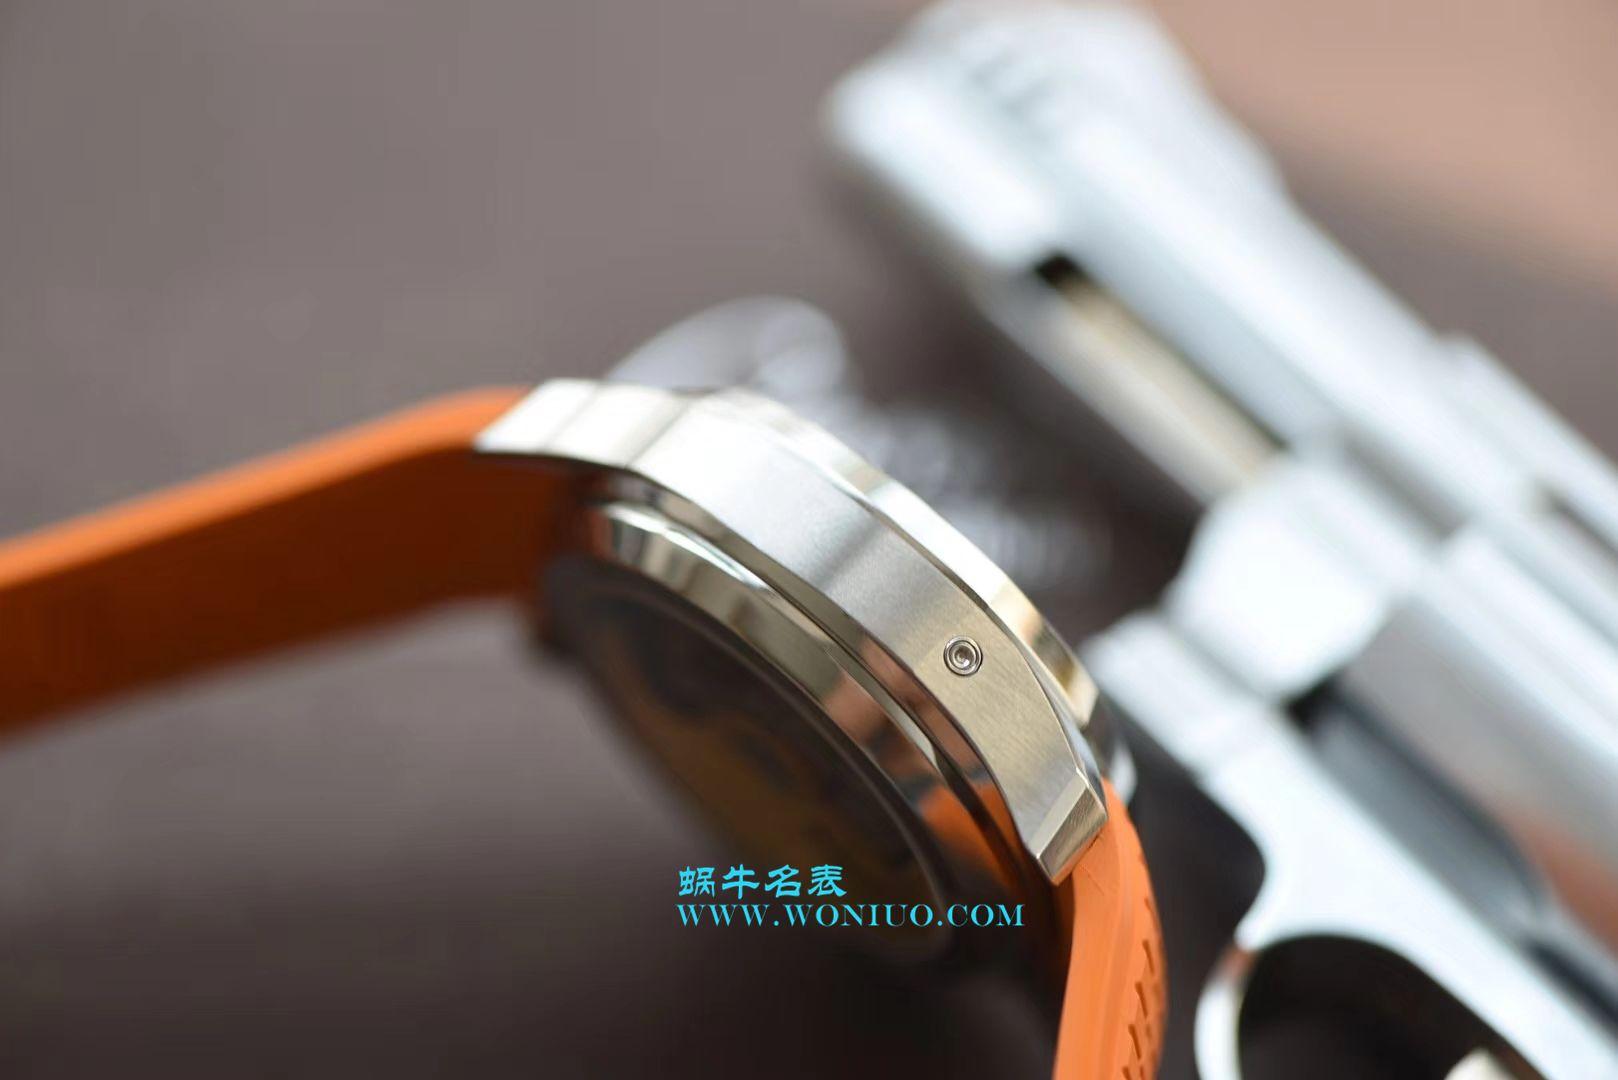 【YL一比一超A高仿手表】百达翡丽手雷AQUANAUT系列5968A-001腕表 / BD227